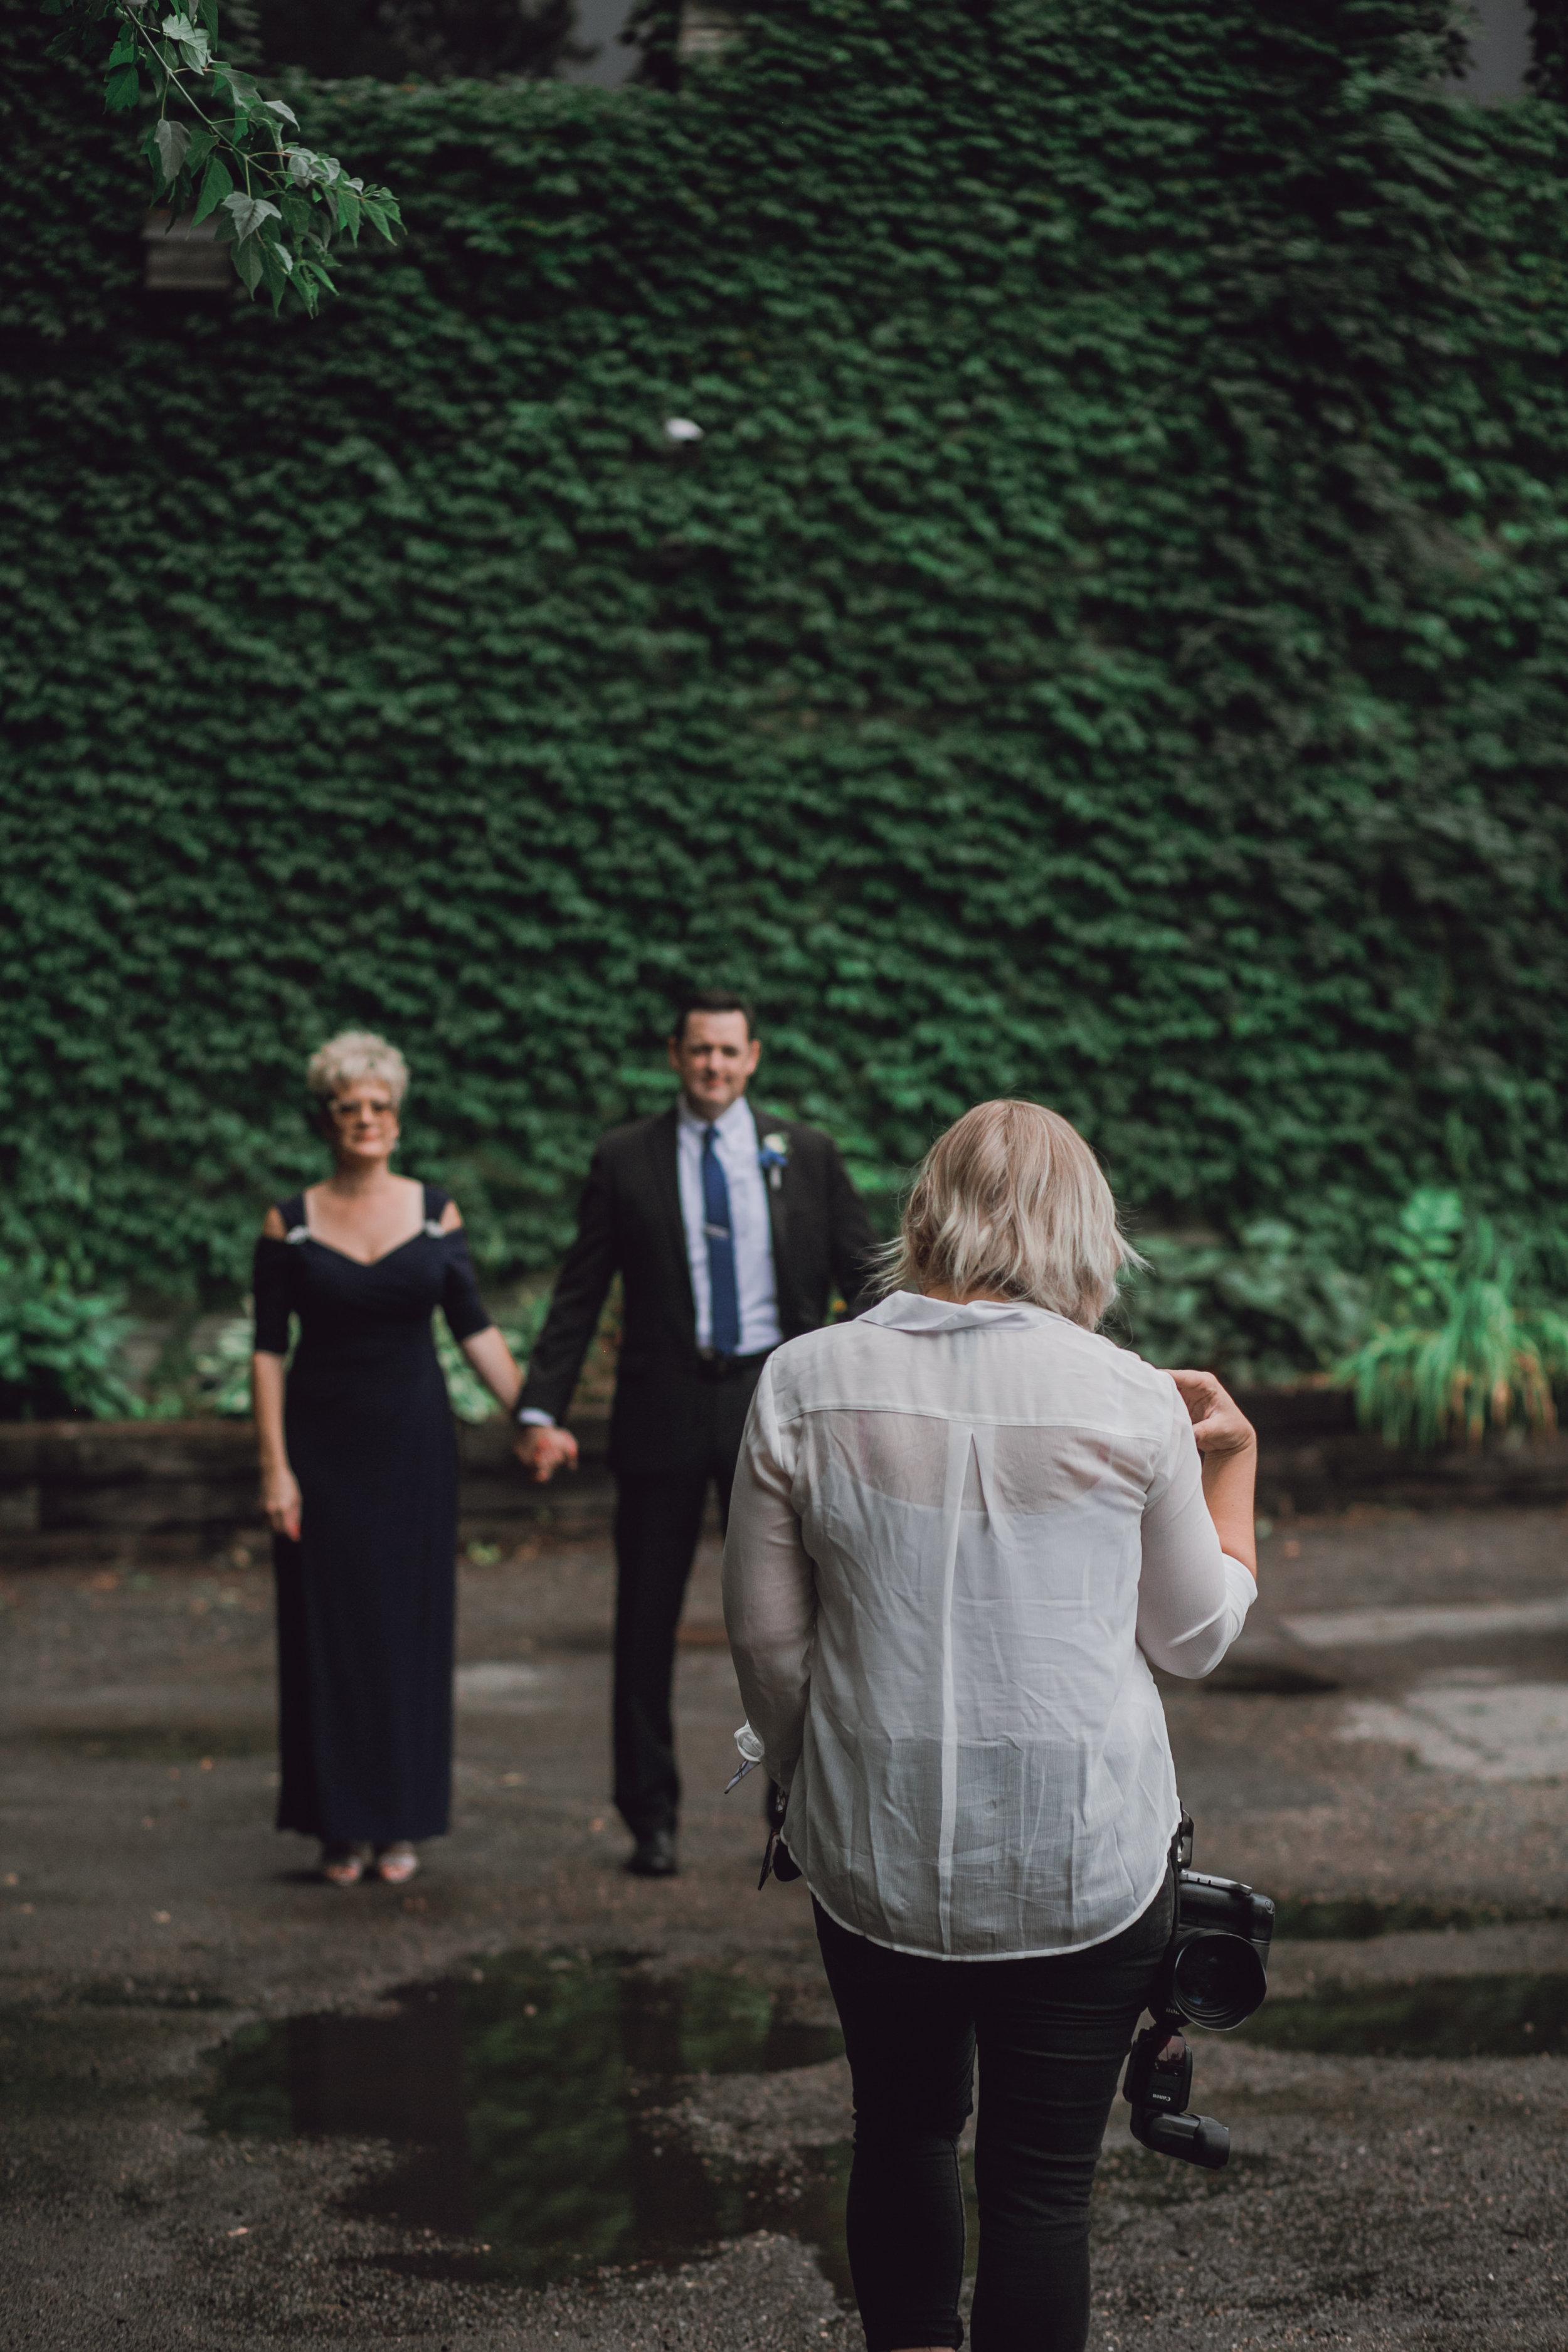 w.a.-frost-wedding-photographer